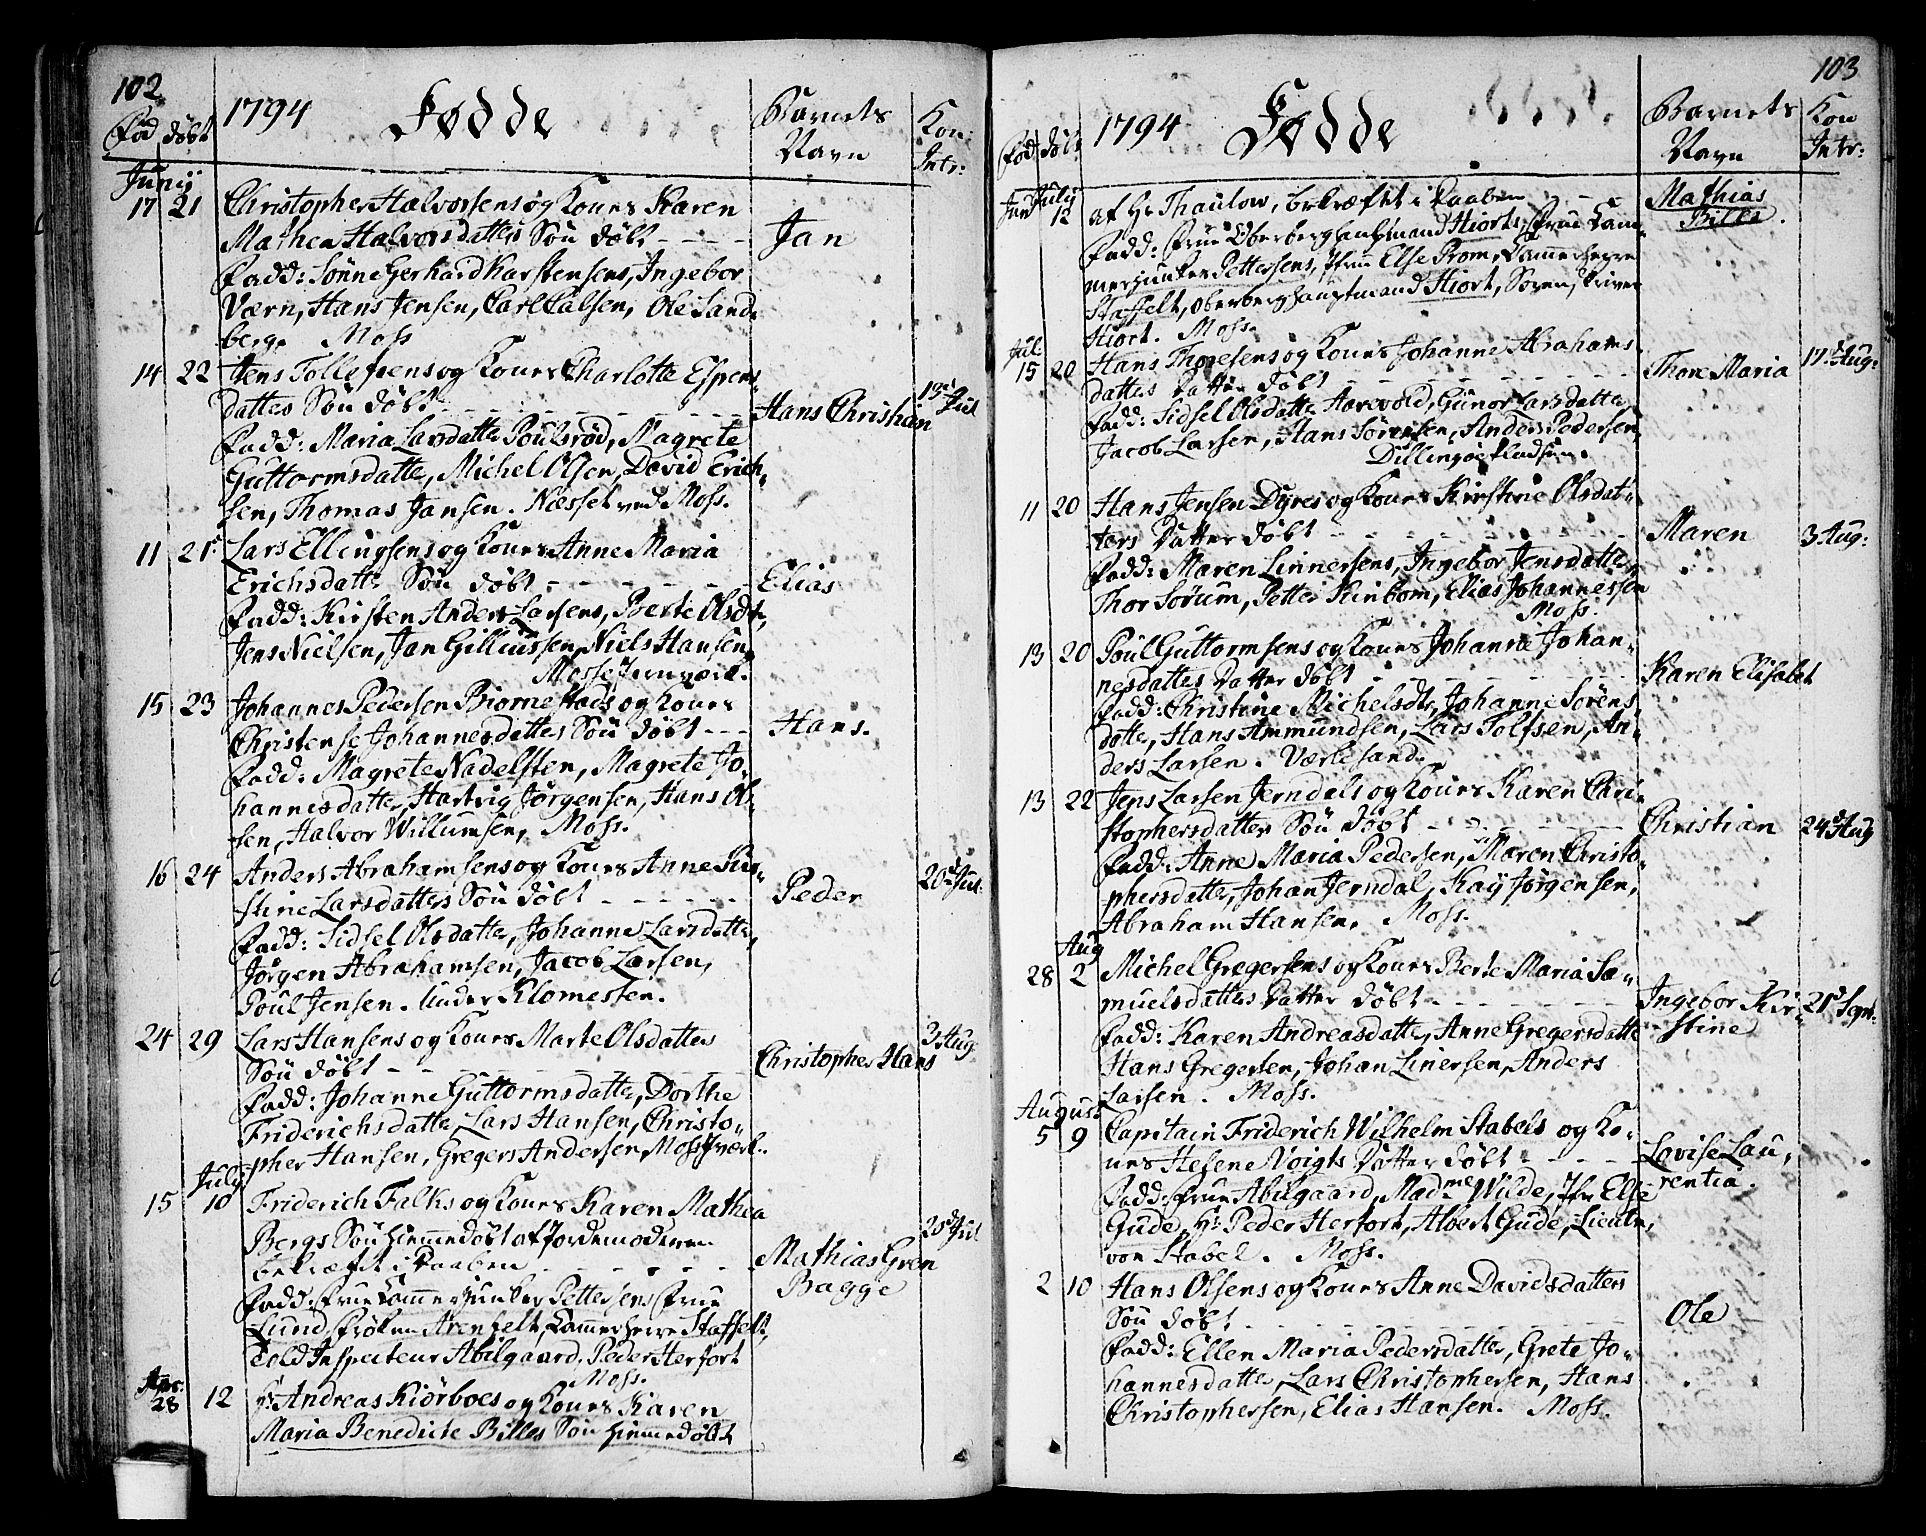 SAO, Moss prestekontor Kirkebøker, F/Fa/Faa/L0004: Ministerialbok nr. I 4, 1784-1808, s. 102-103